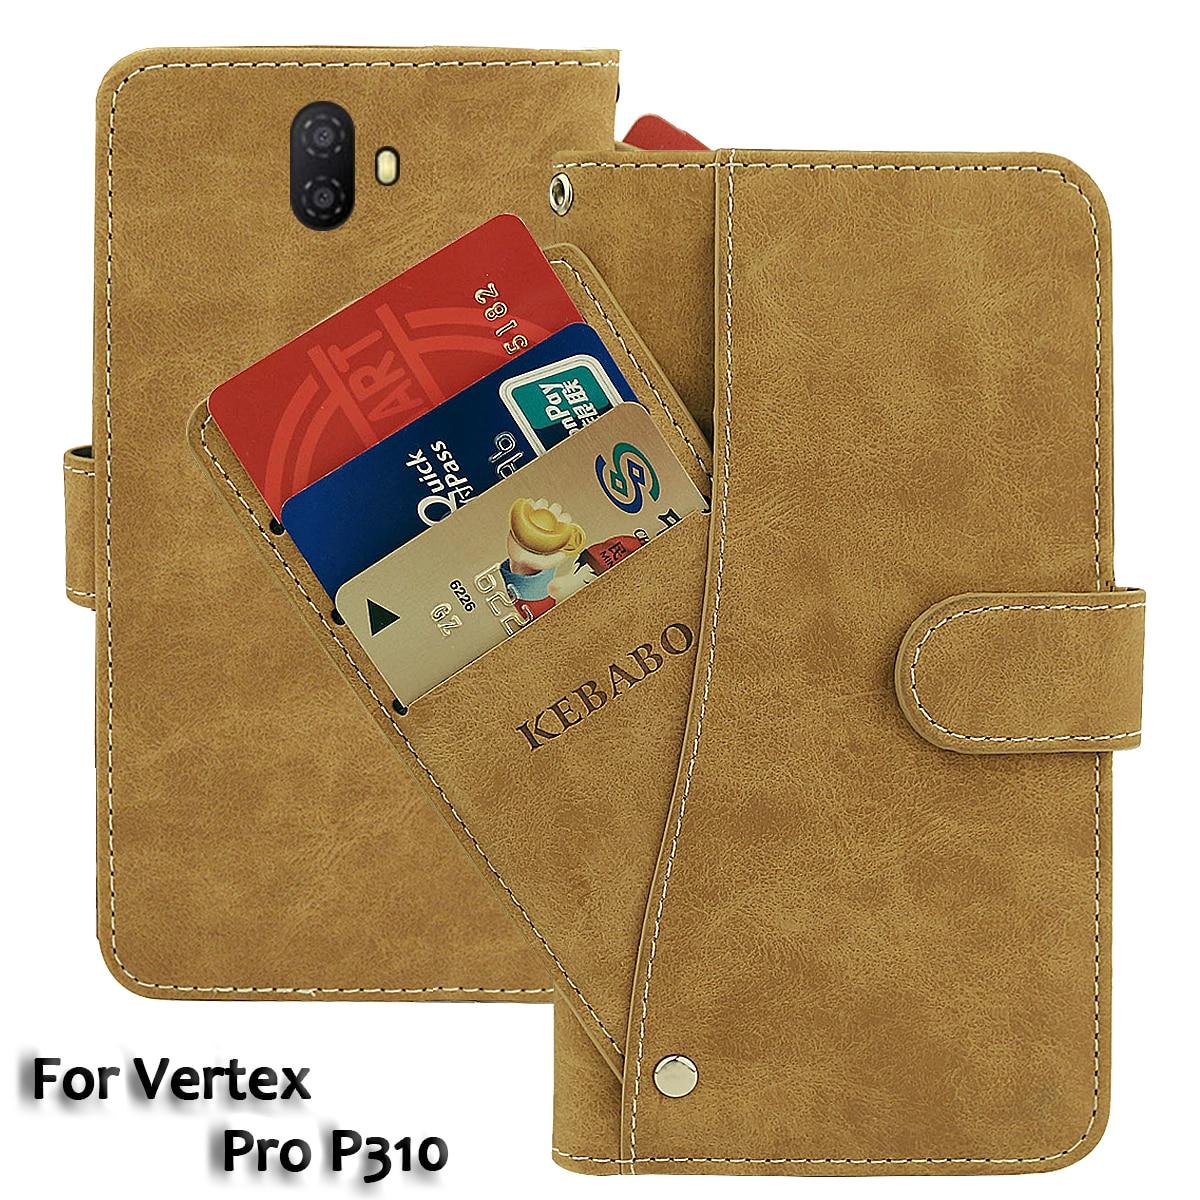 Vintage Leather Wallet Vertex Pro P310 Case 6.53